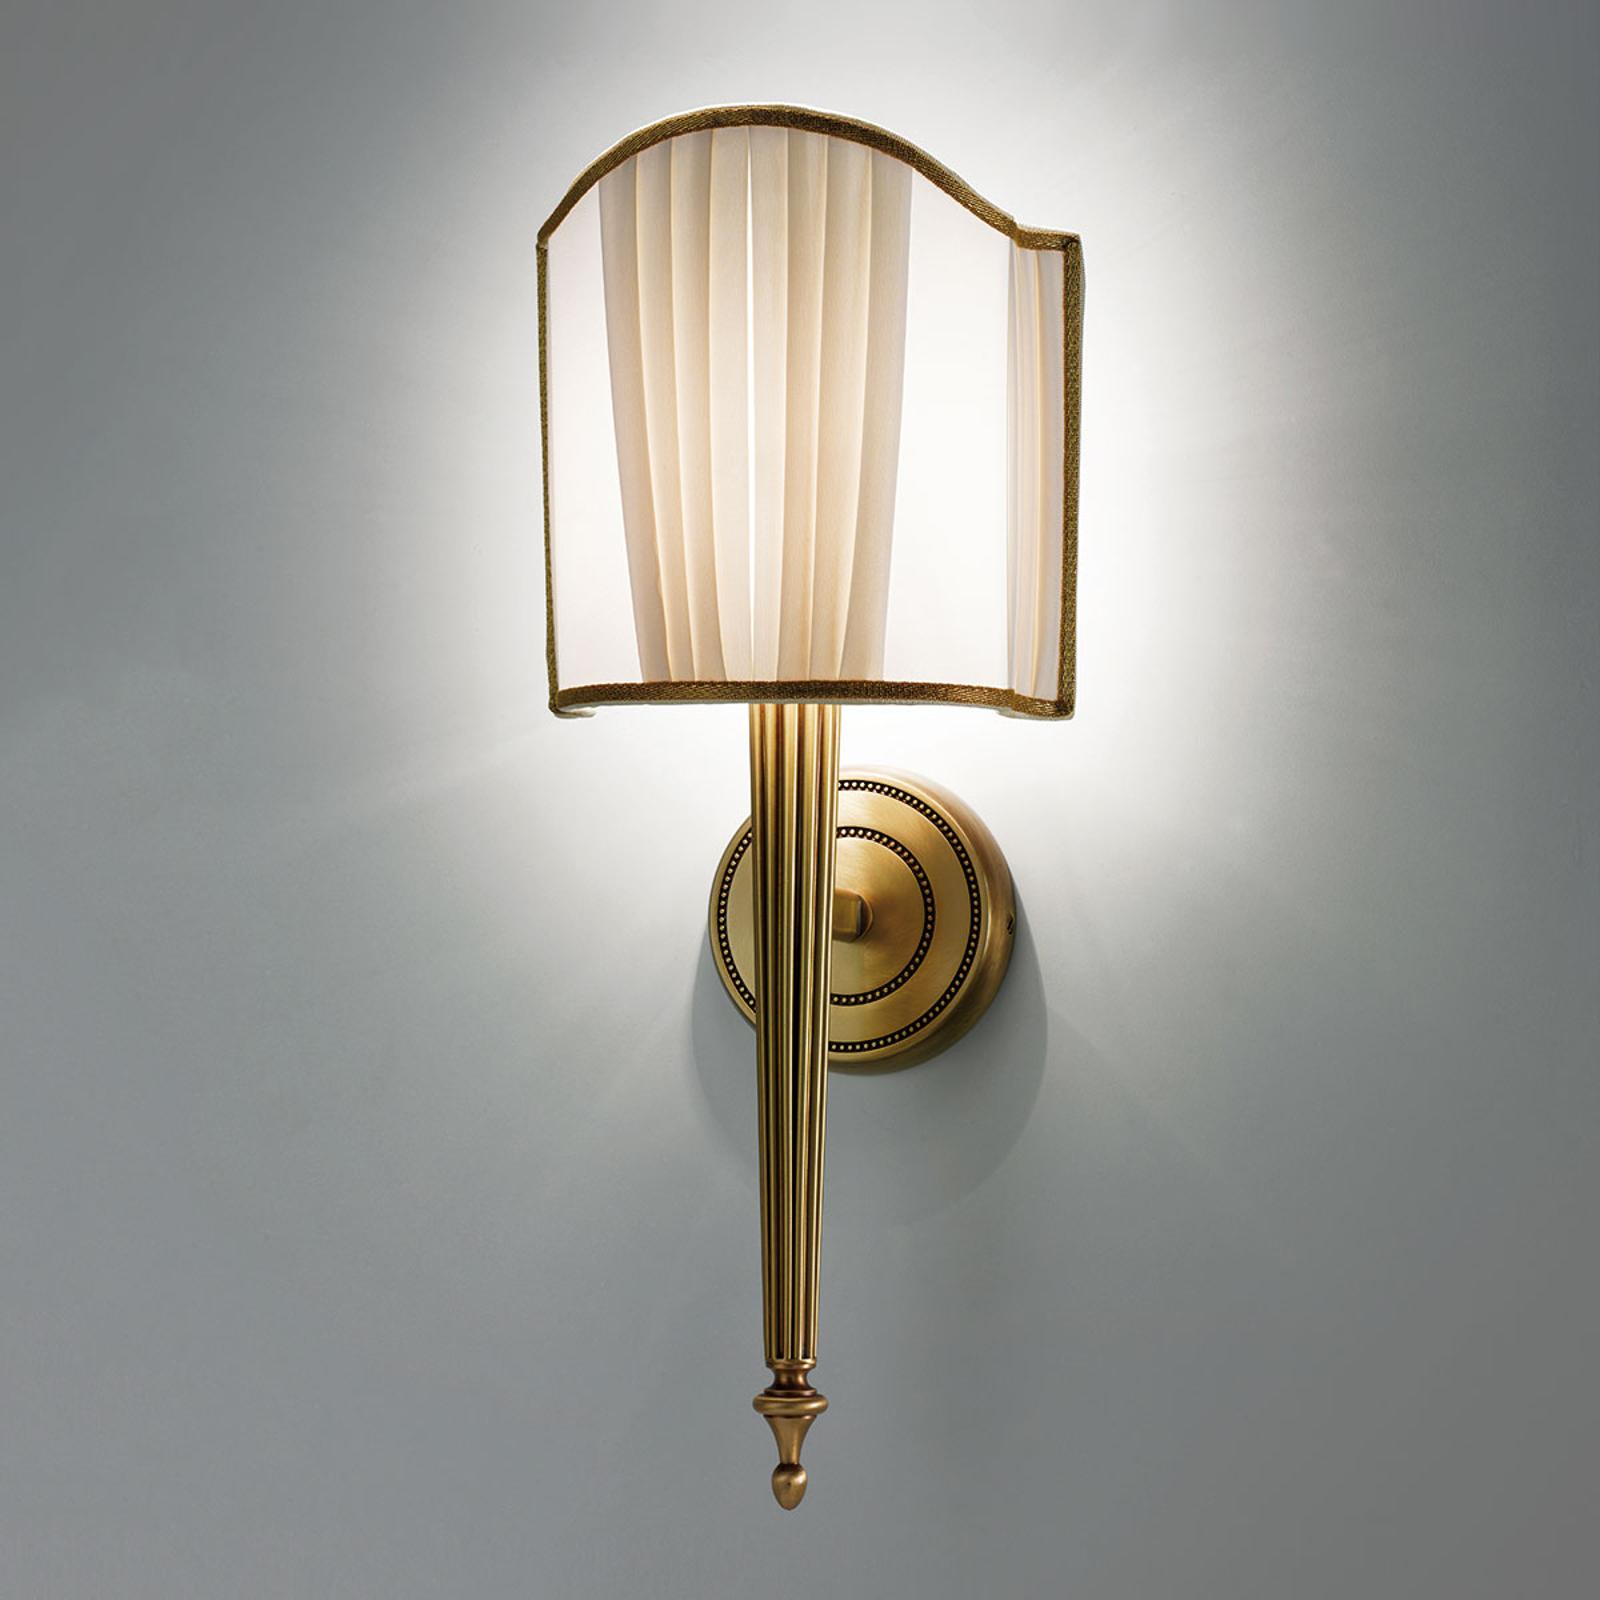 Belle Epoque wall light in antique brass_2008187_1